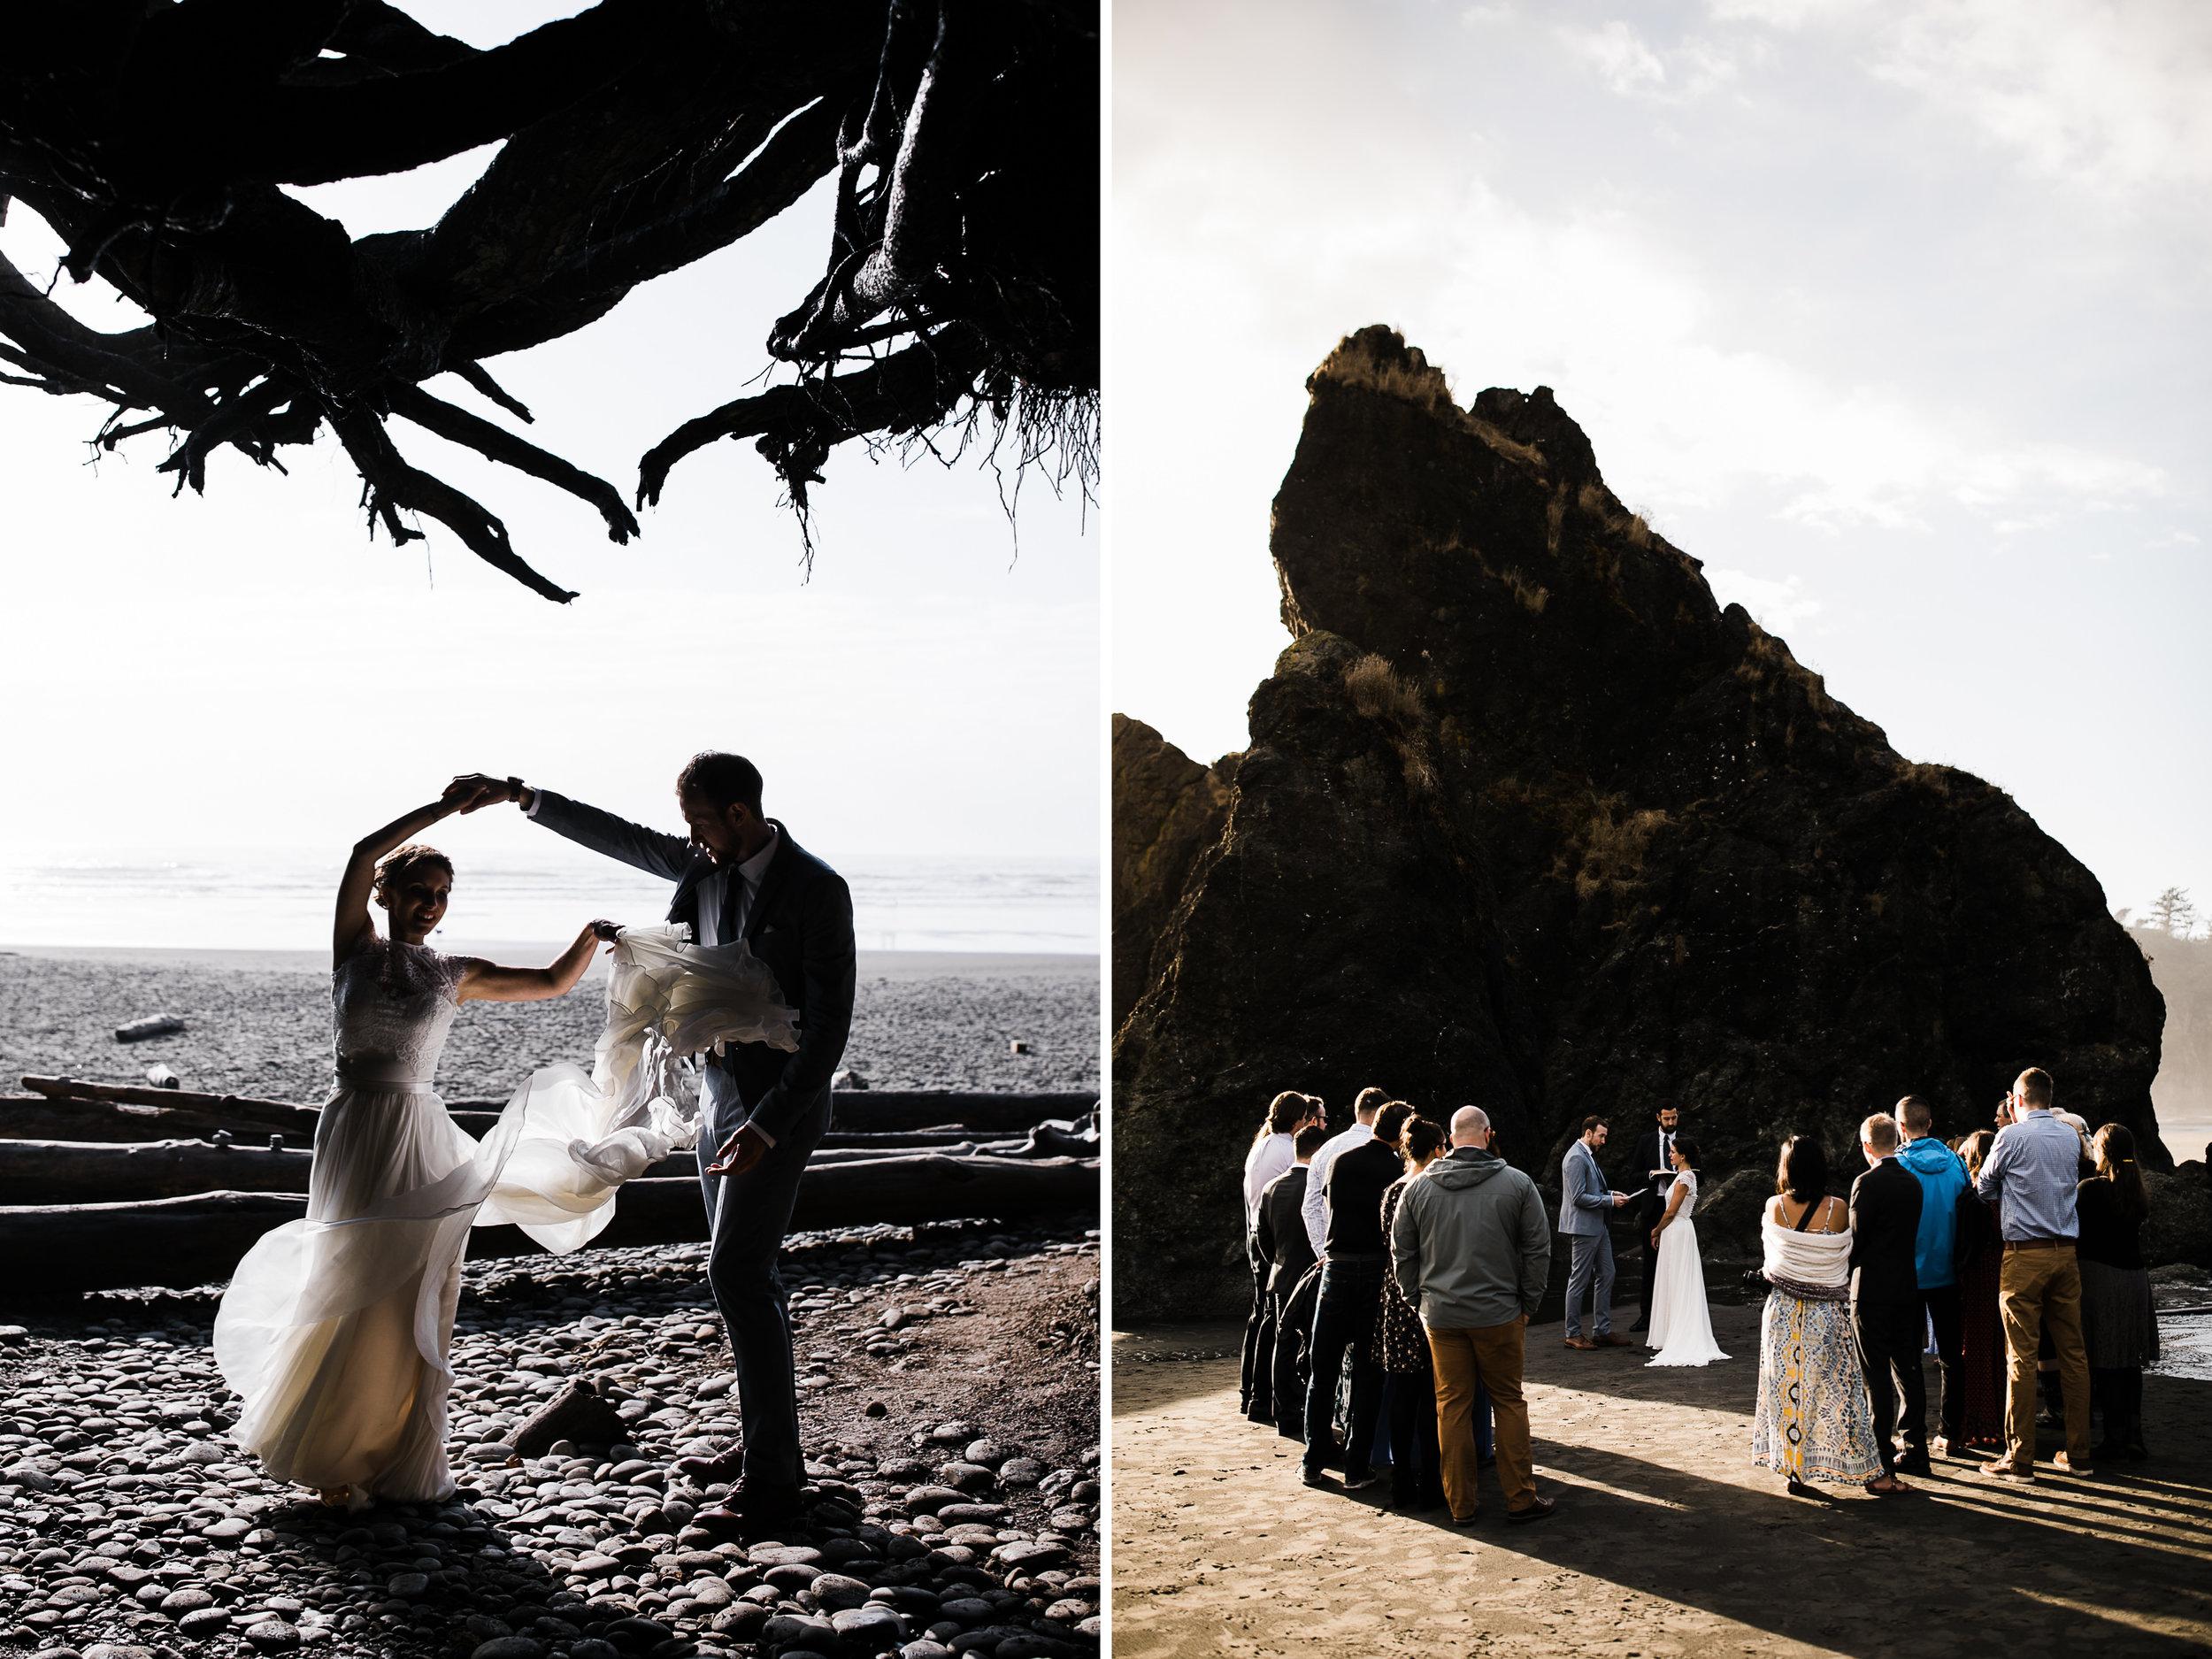 intimate rainy wedding day in olympic national park | destination adventure wedding photographers | the hearnes adventure photography | www.thehearnes.com